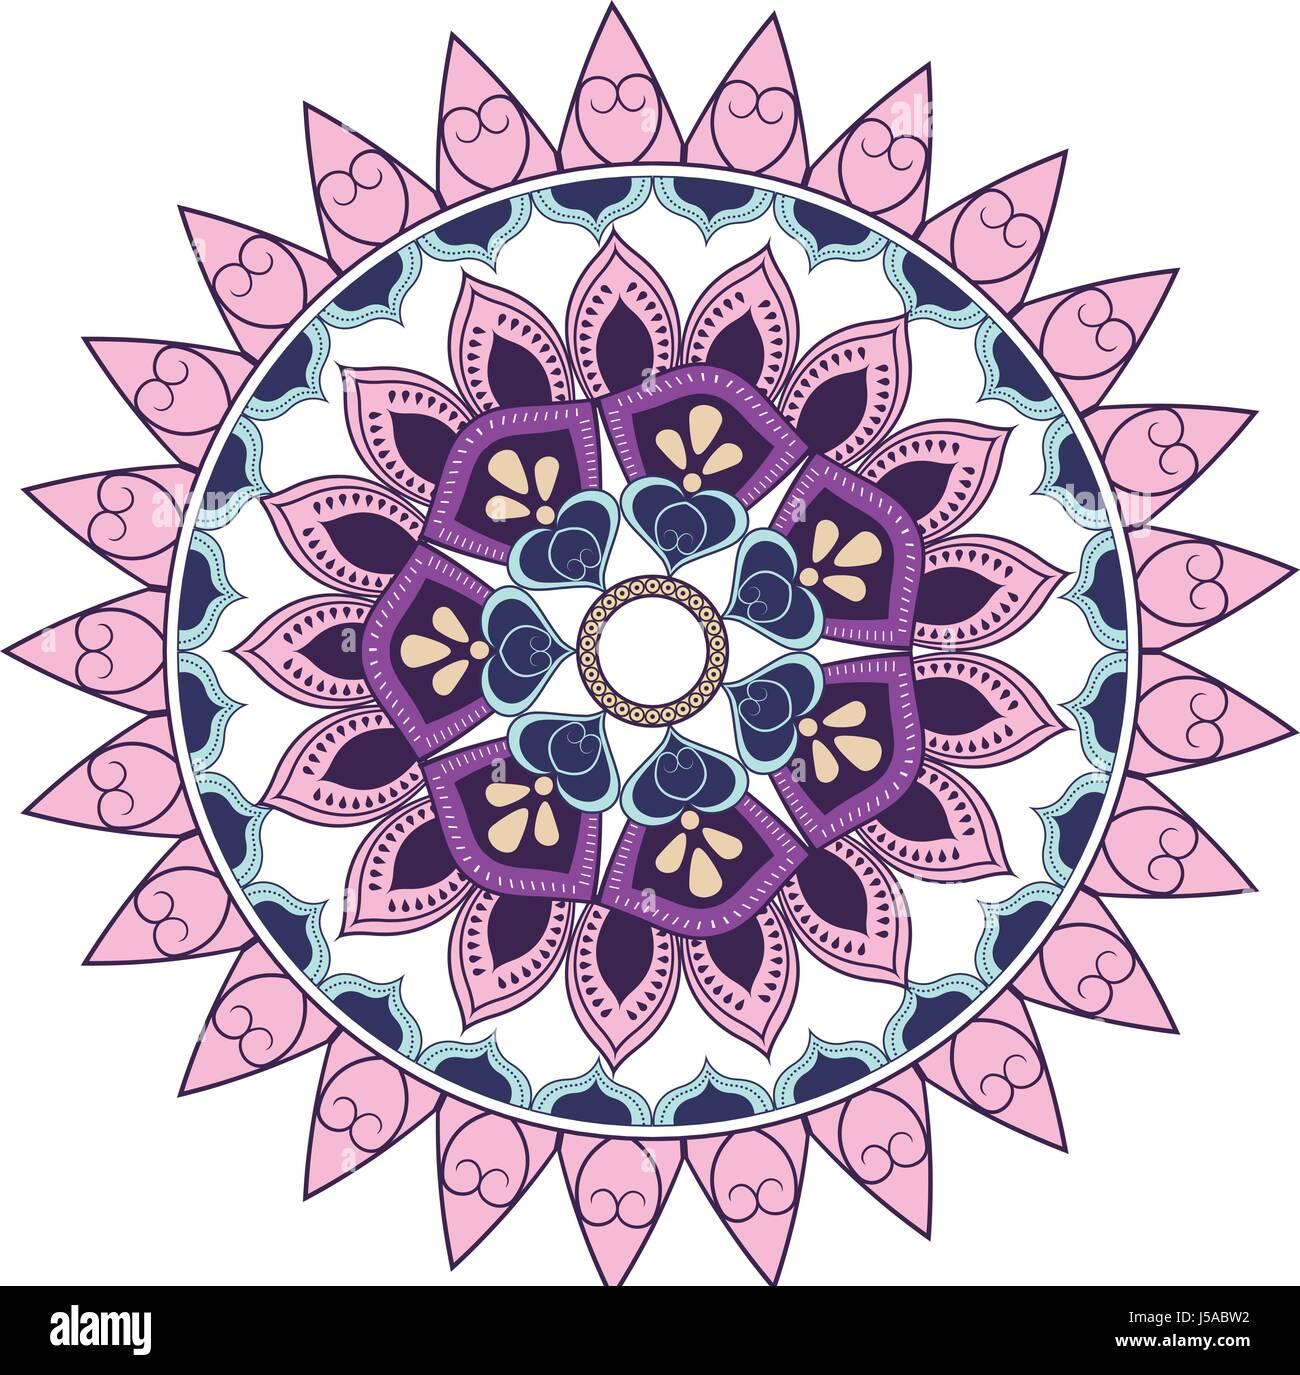 mandala decoration spiritual oriental. mystical ornament element - Stock Image